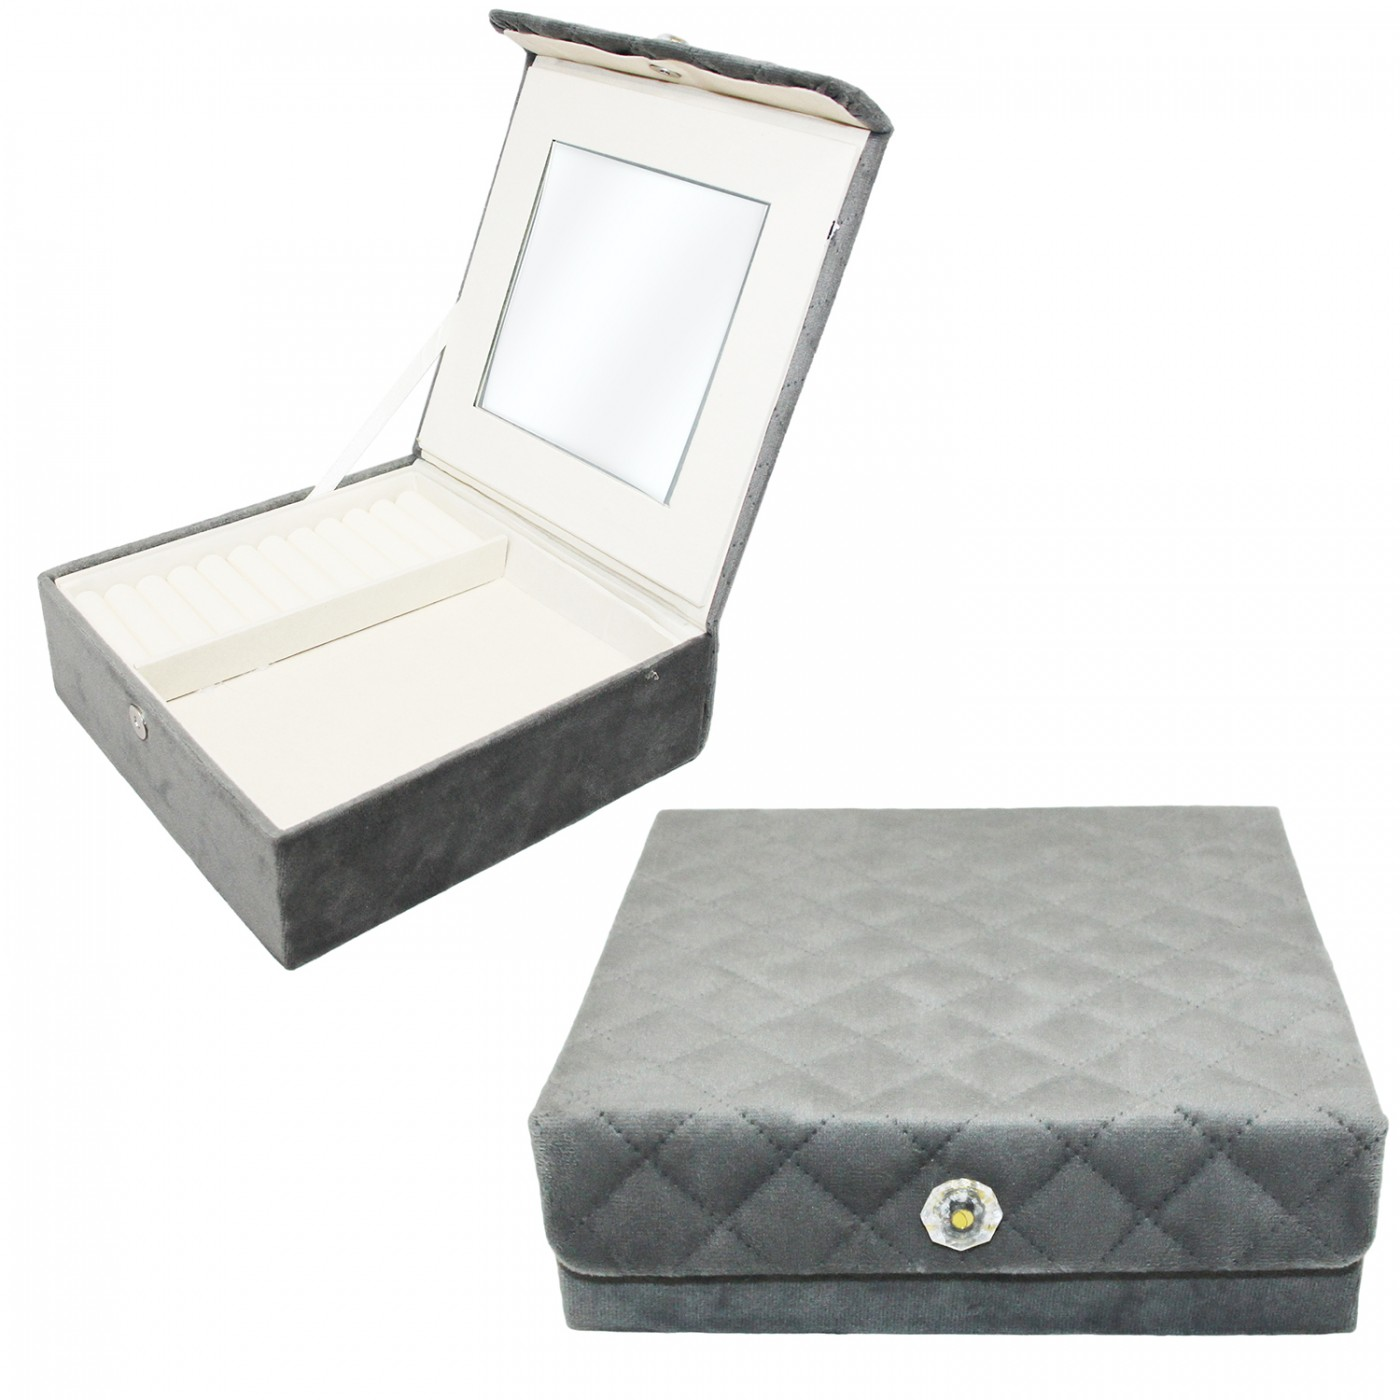 Szkatułka schowek na biżuterię - welurowa pikowana